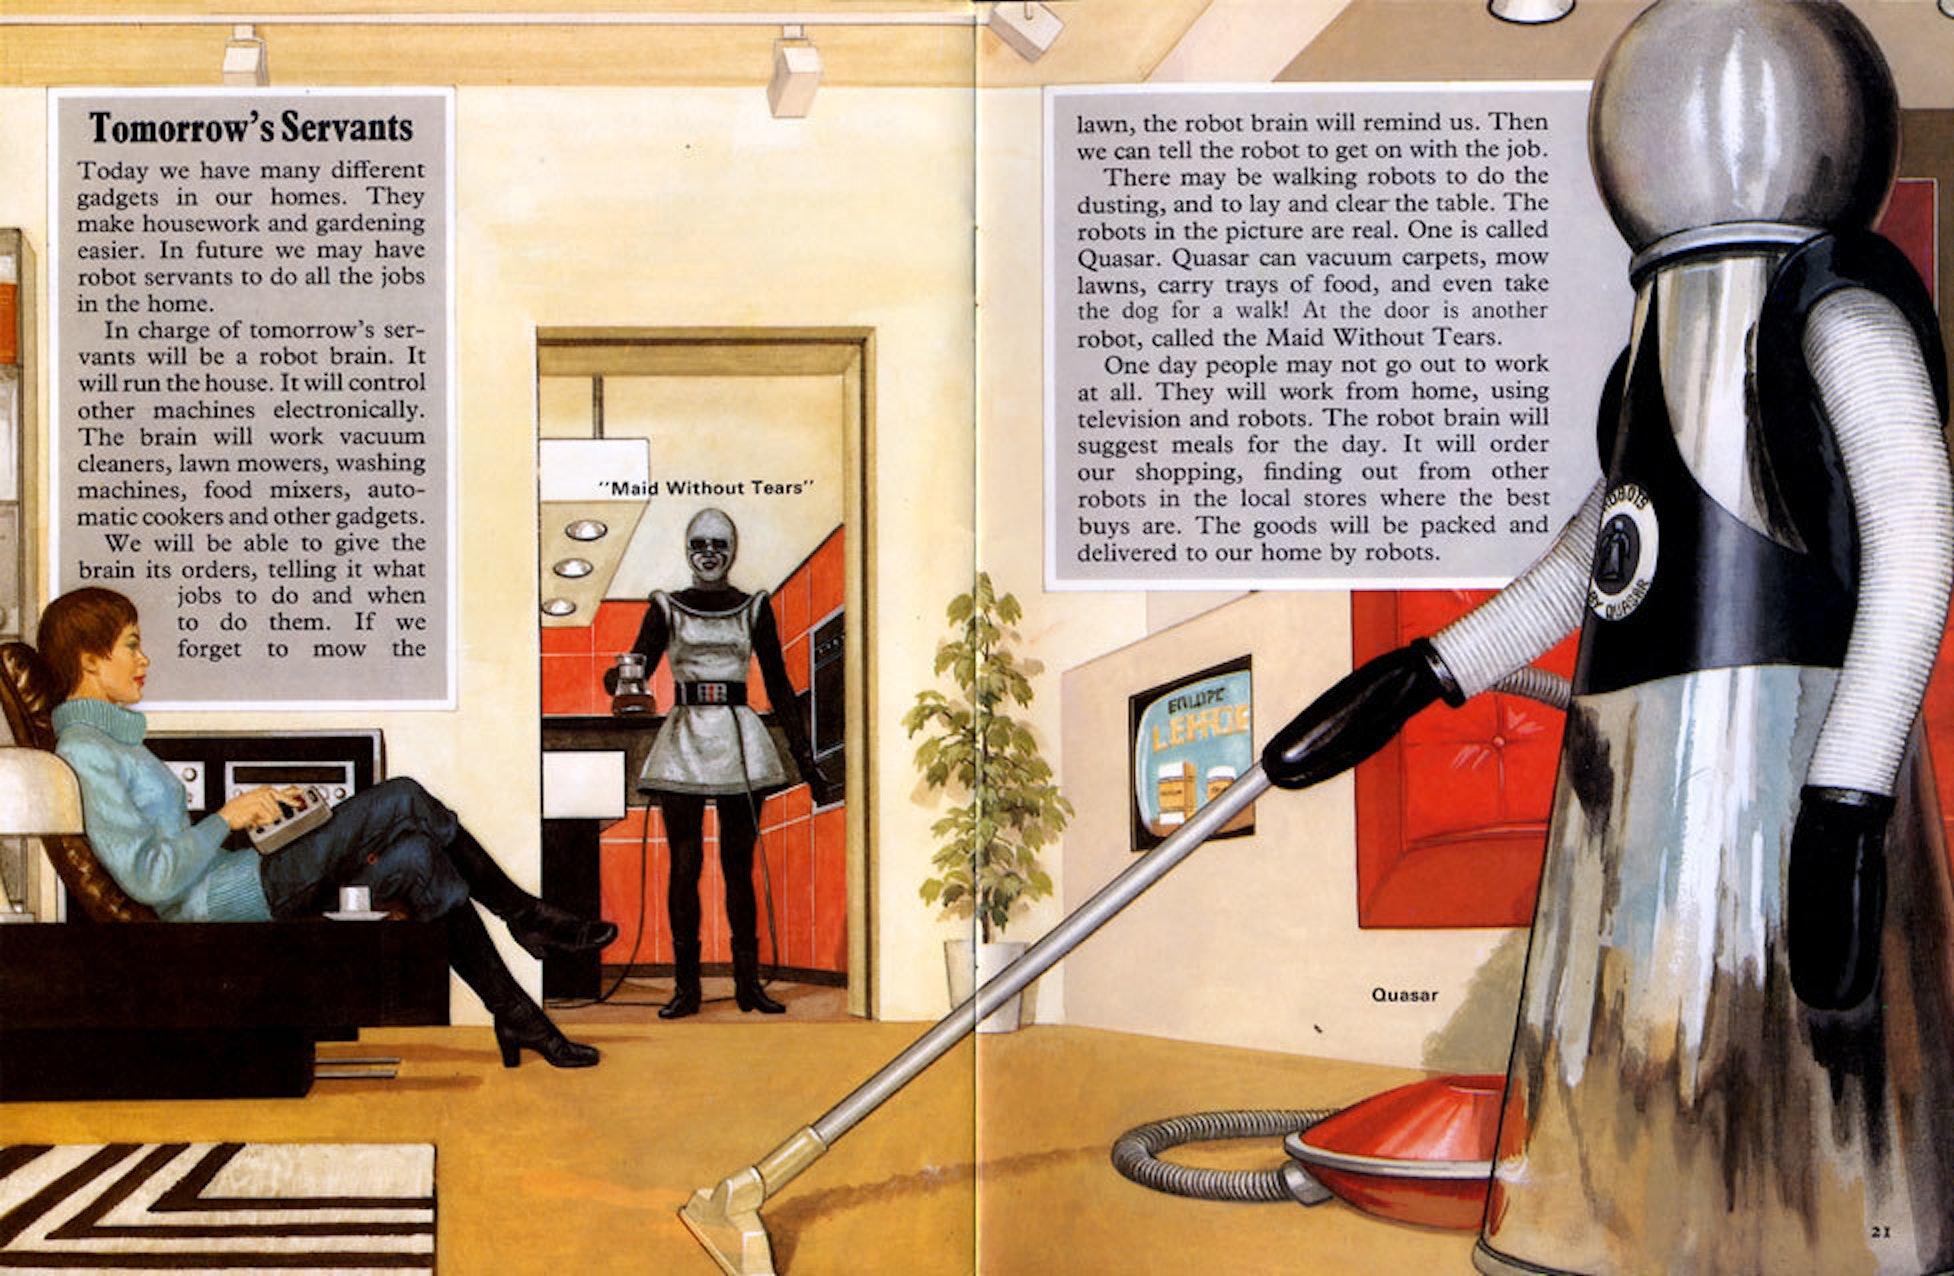 From Paleofuture (Matt Chapman from 'Exploring the World of Robots' by Jonathan Rutland)